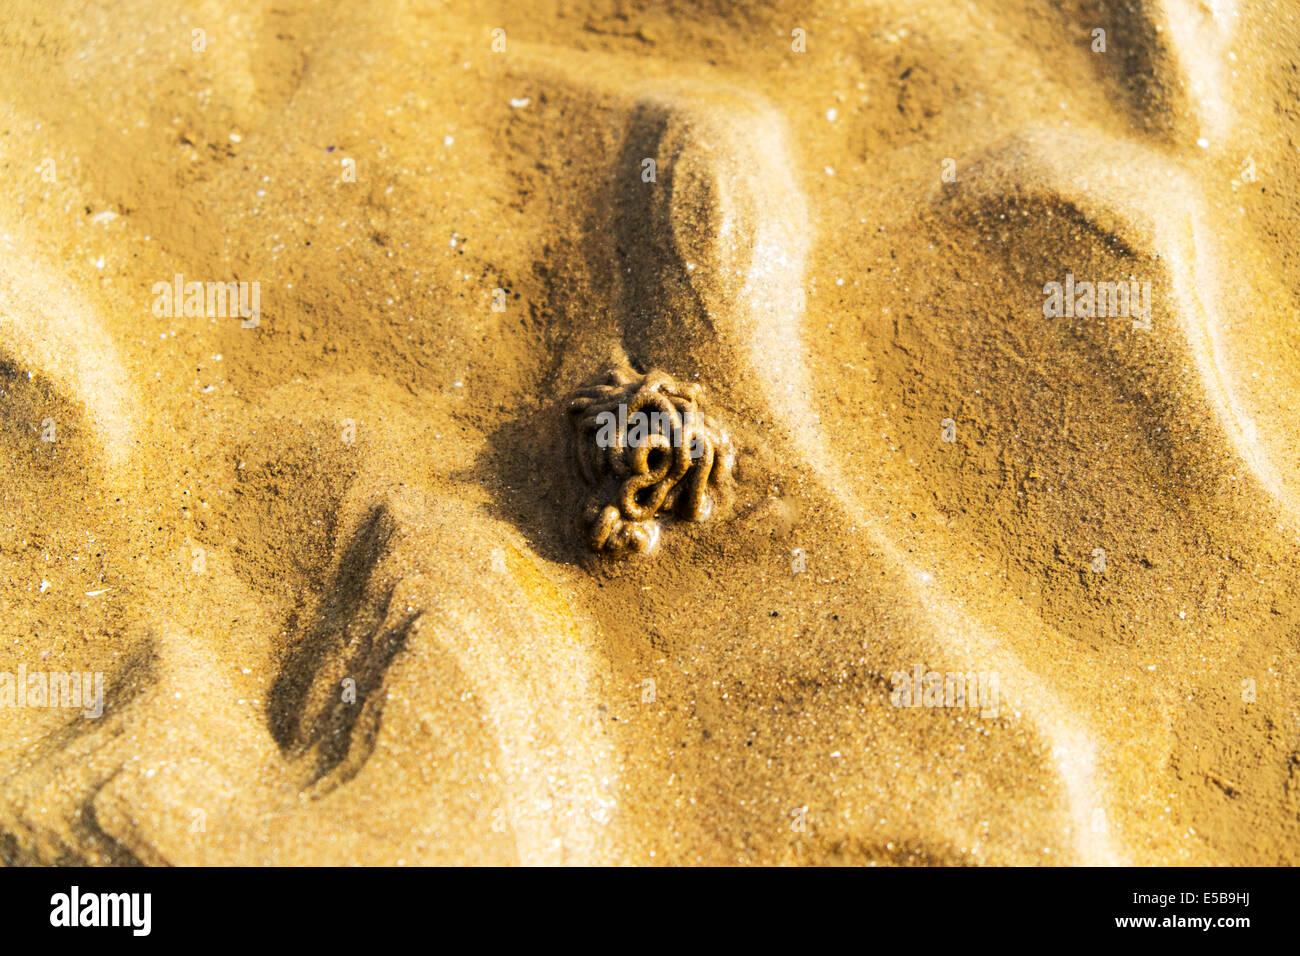 Lugworm Ragworm European Lugworm Arenicola marina cast of defaecated sediments on the beach at low tide - Stock Image